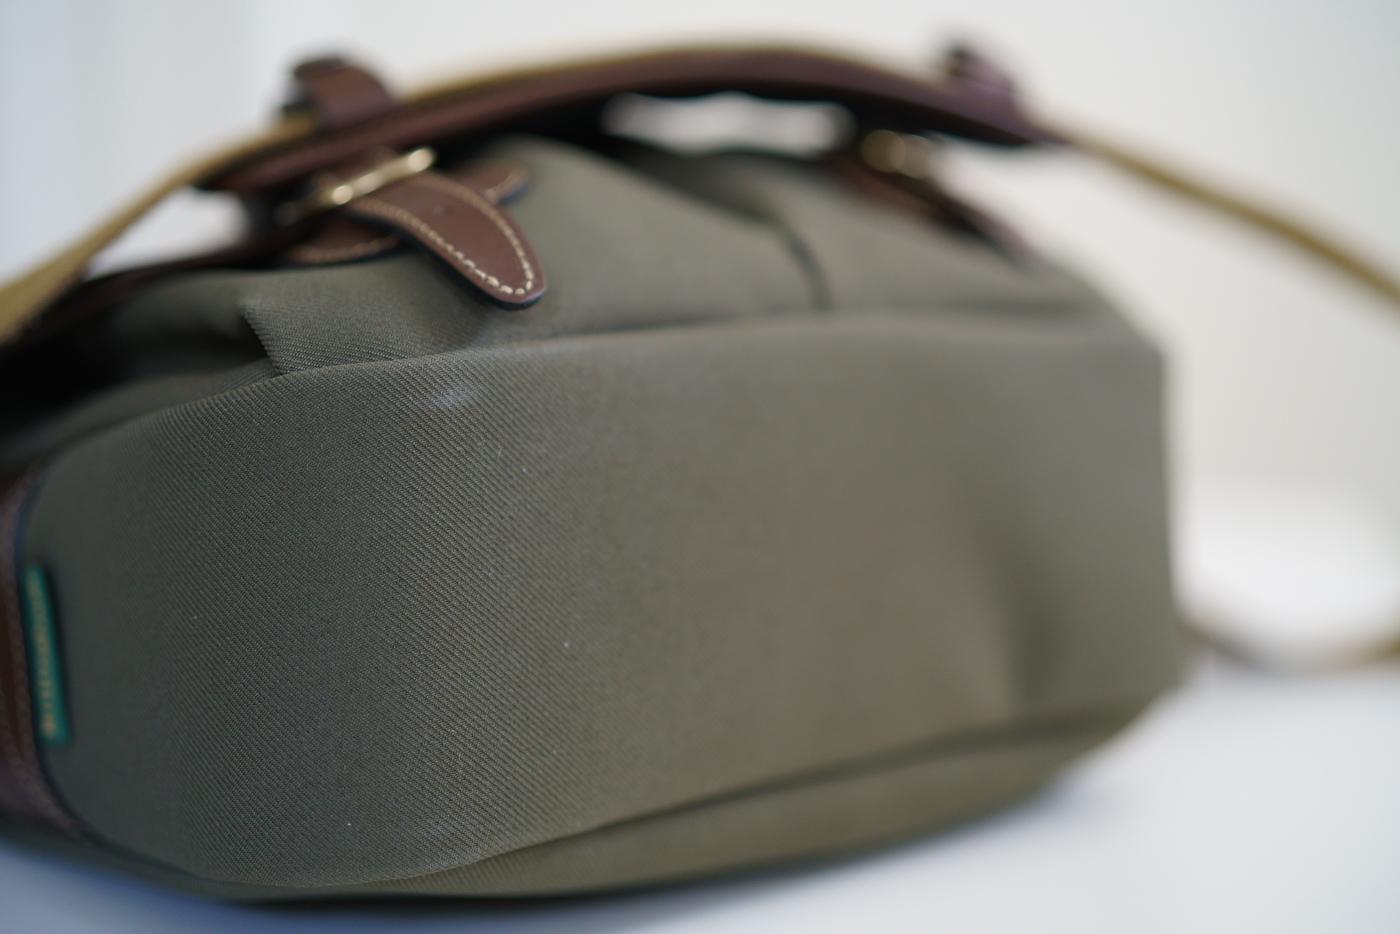 Sold Billingham Hadley Small Sage Sp40 Shoulder Pad 150 Fm Bag Choc Leather Trim Jan 07